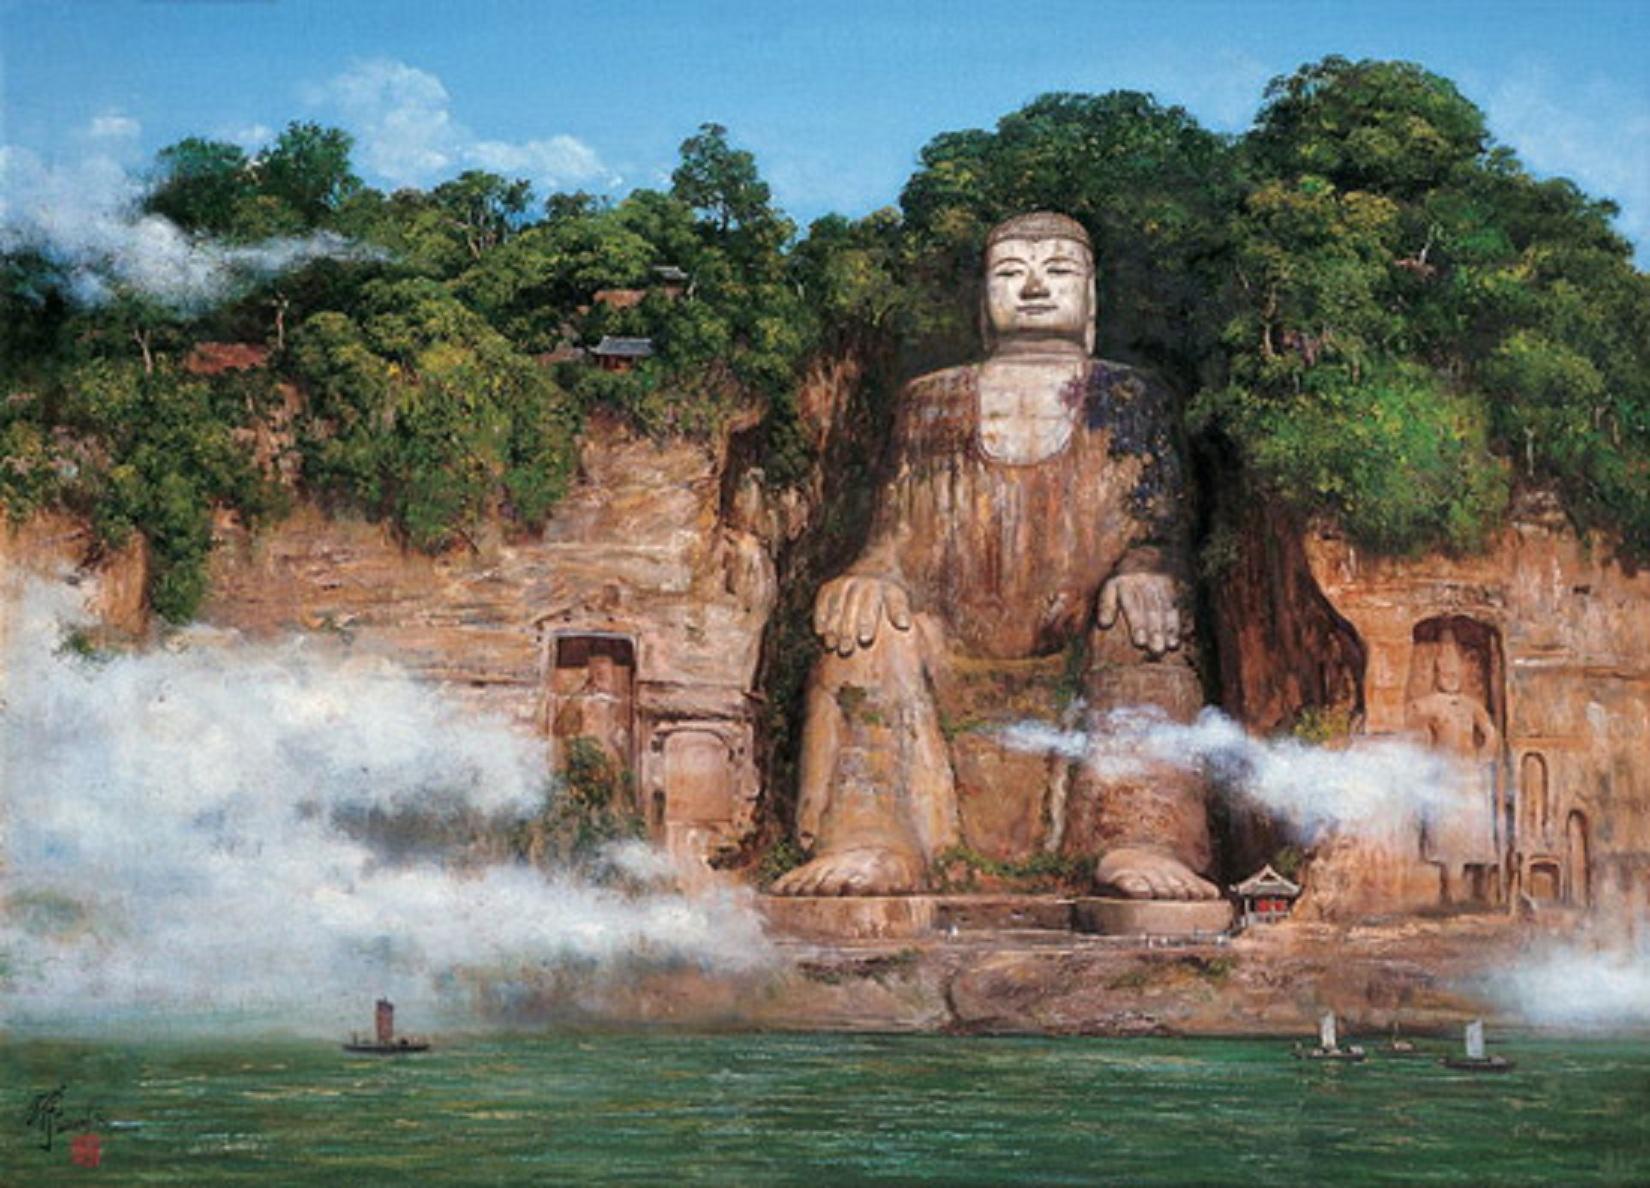 Buddha Wallpaper pictures HD mountain sculpture nature